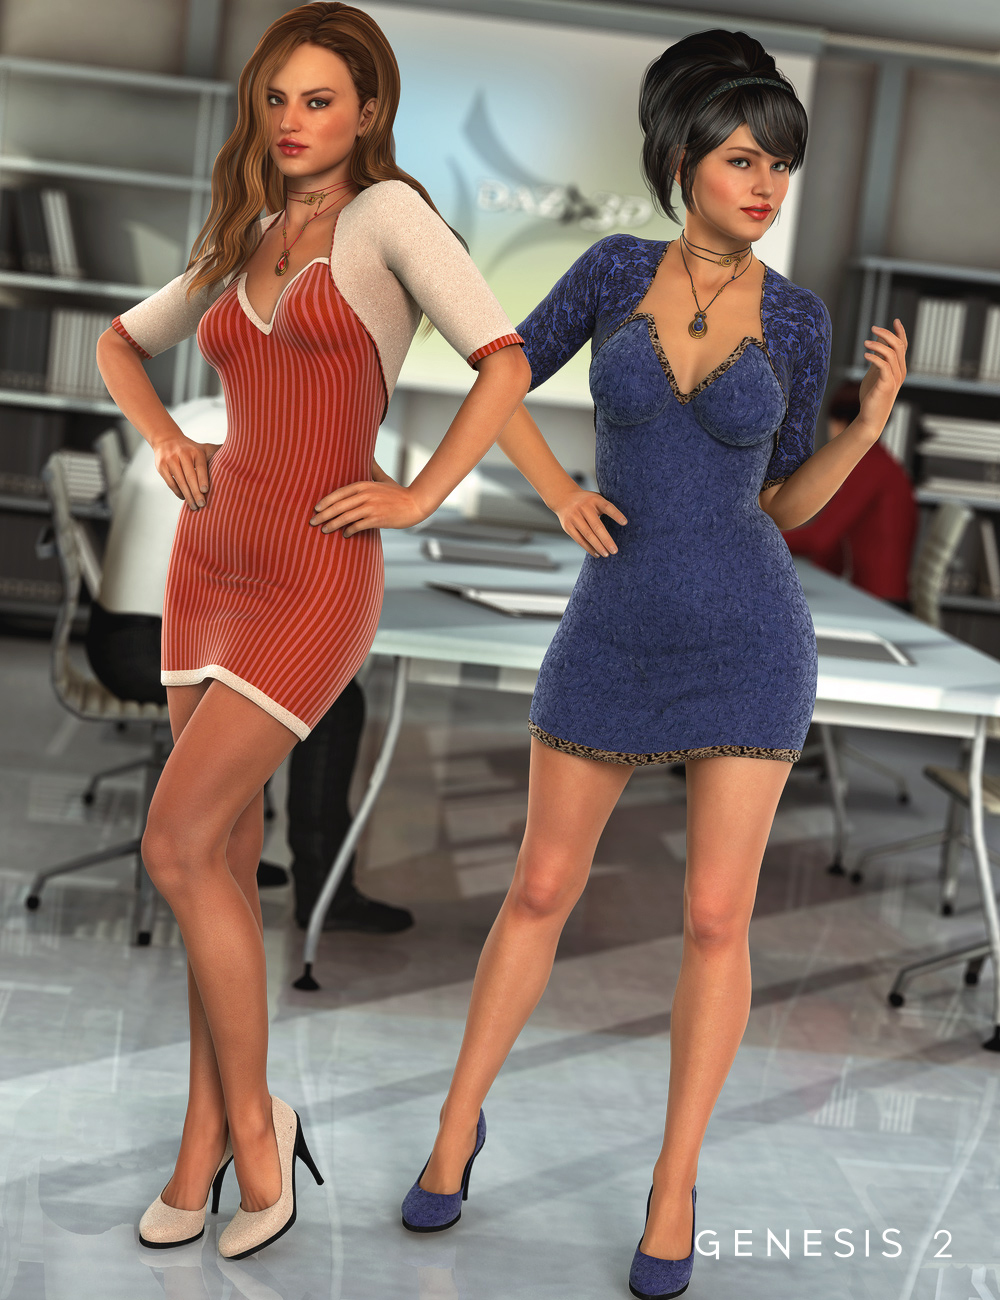 HR for Job Interview by: bucketload3d, 3D Models by Daz 3D